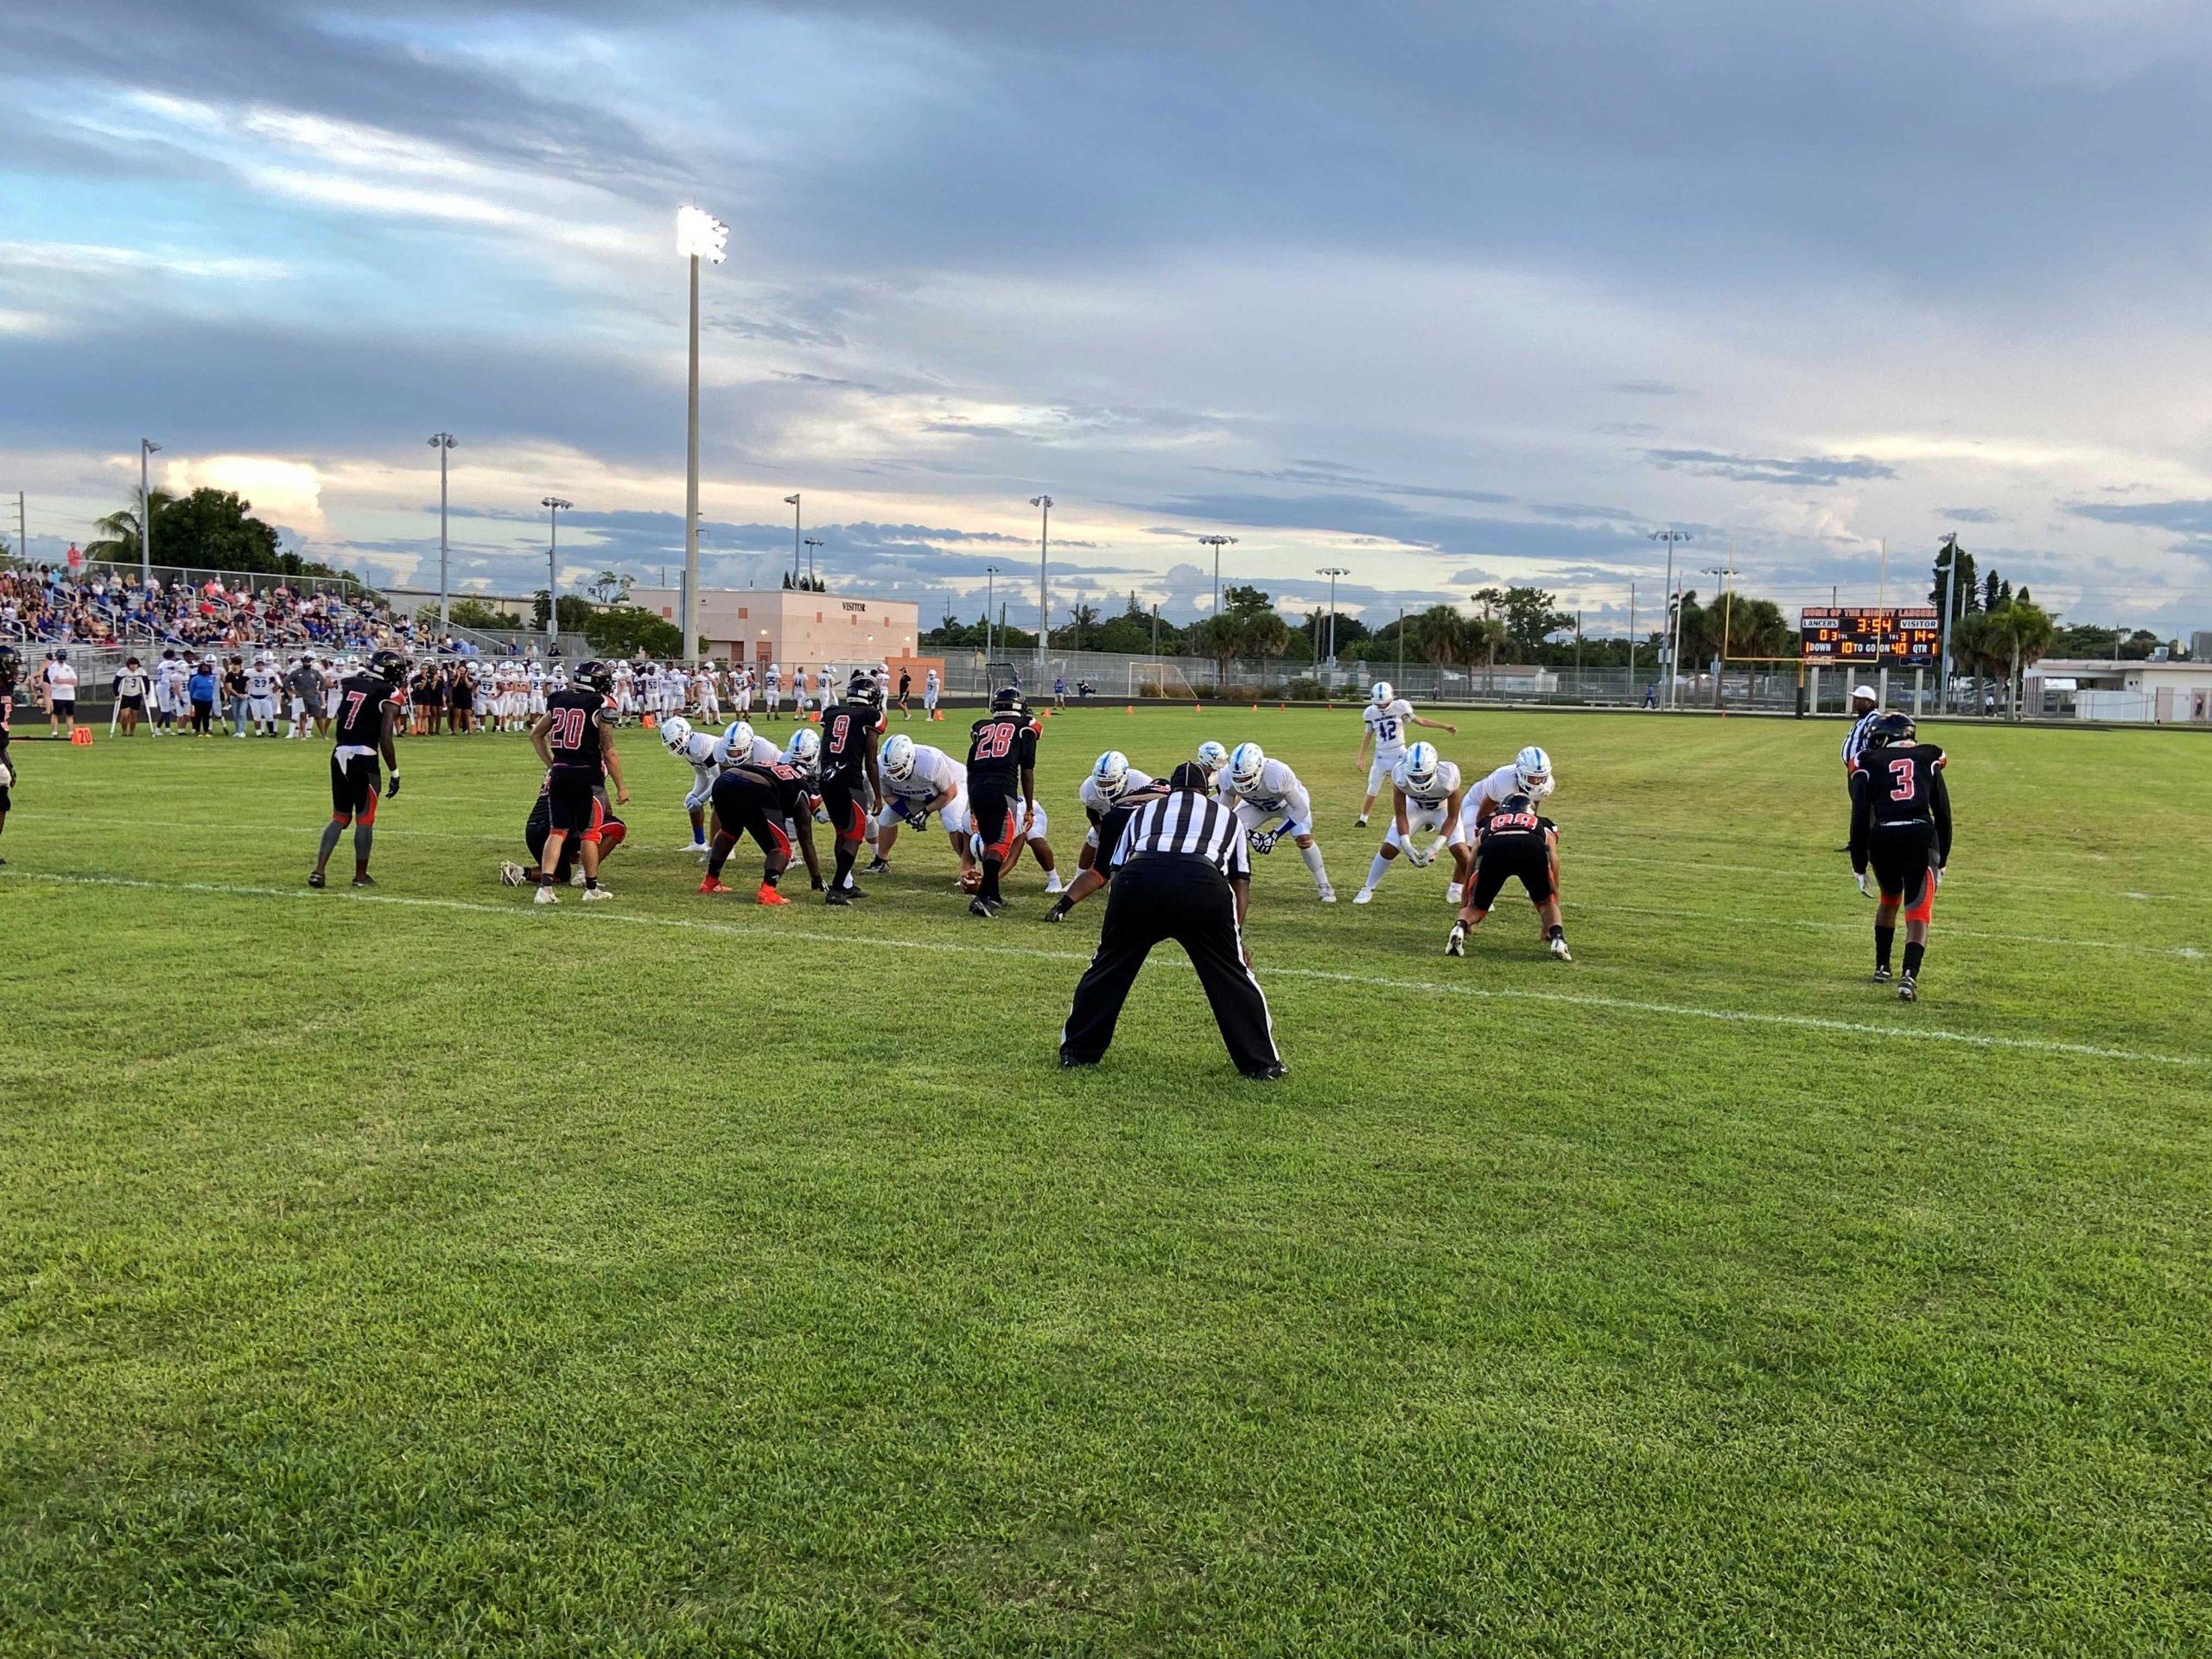 PHOTOS: Week 5 of High School Football in Palm Beach County and the Treasure Coast